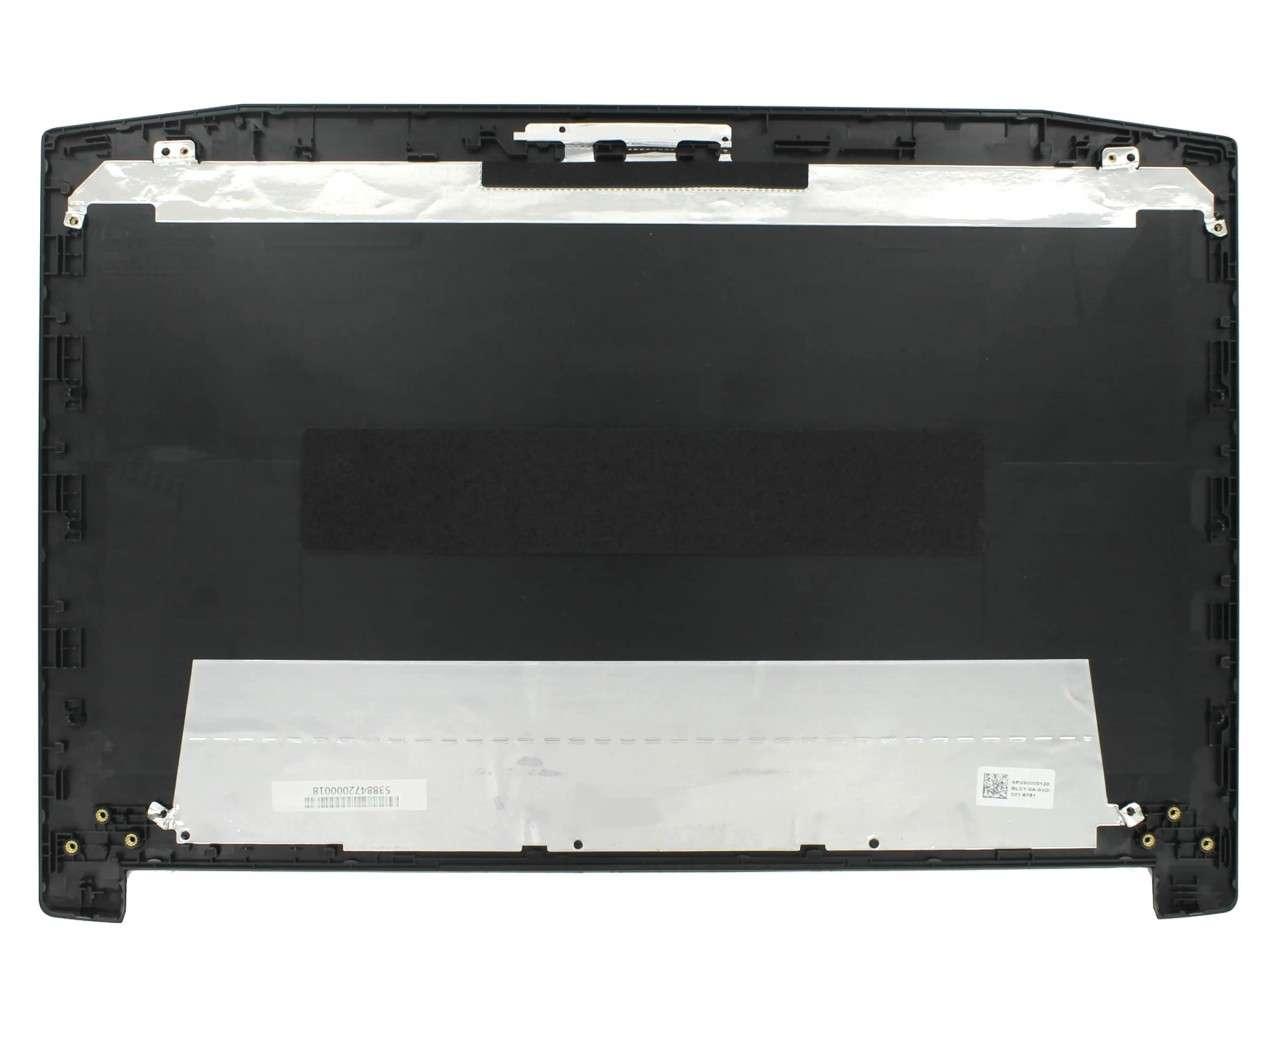 Capac Display BackCover Acer Nitro 5 AN515-53 Carcasa Display imagine powerlaptop.ro 2021